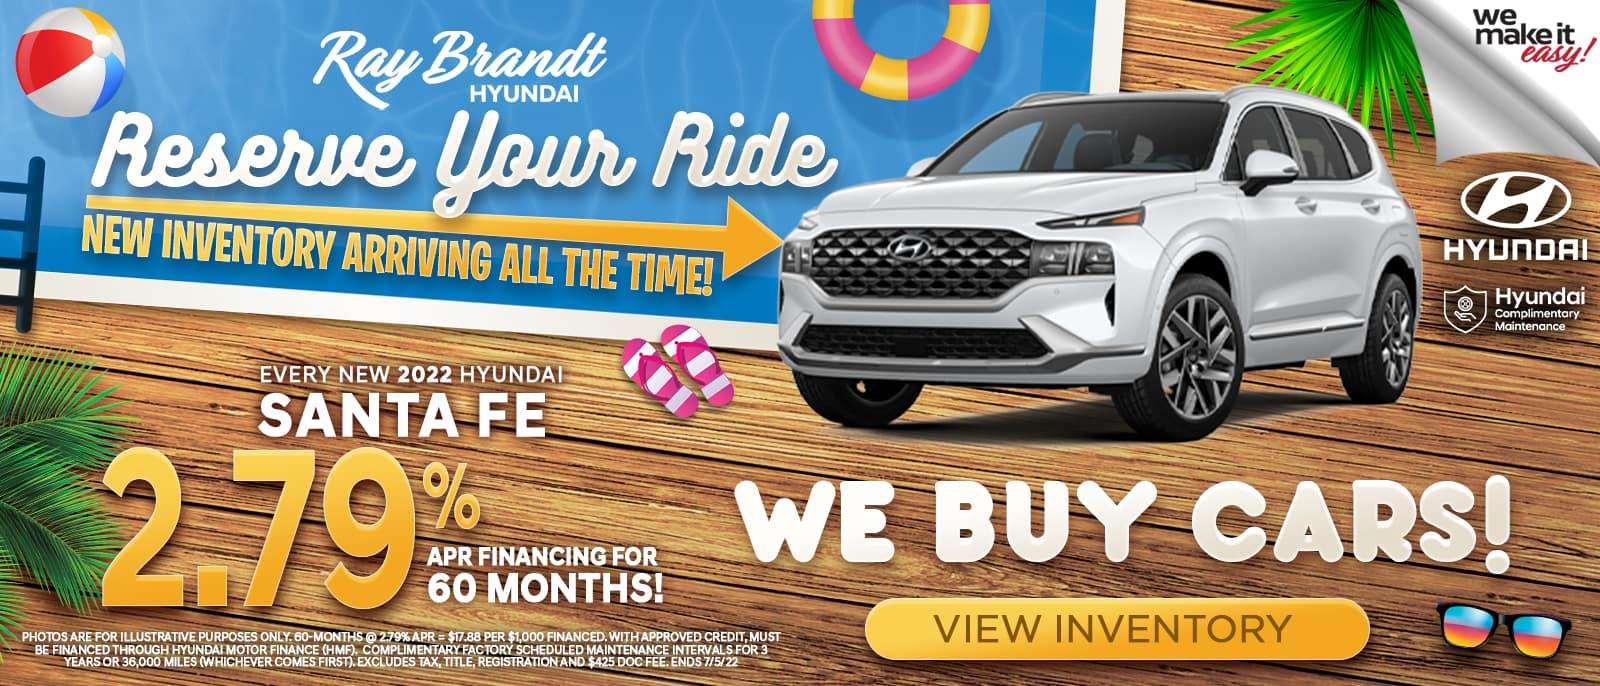 Hyundai SantaFe for sale, specials, savings, buy today